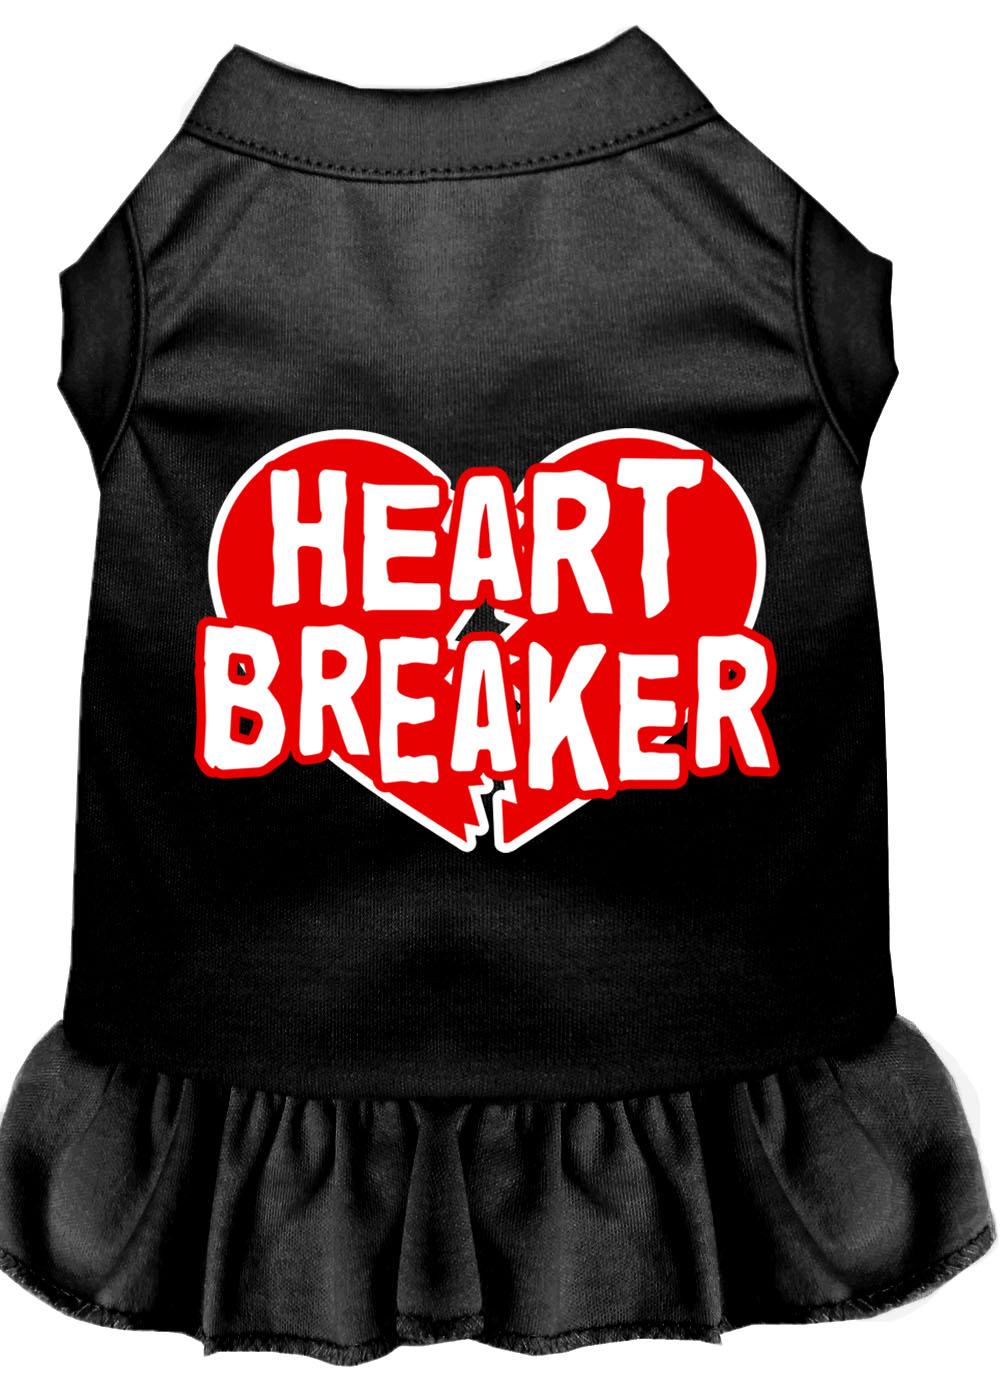 Heart breaker screen print dress black xxl 18 for Xxl 18 xxl 2012 black